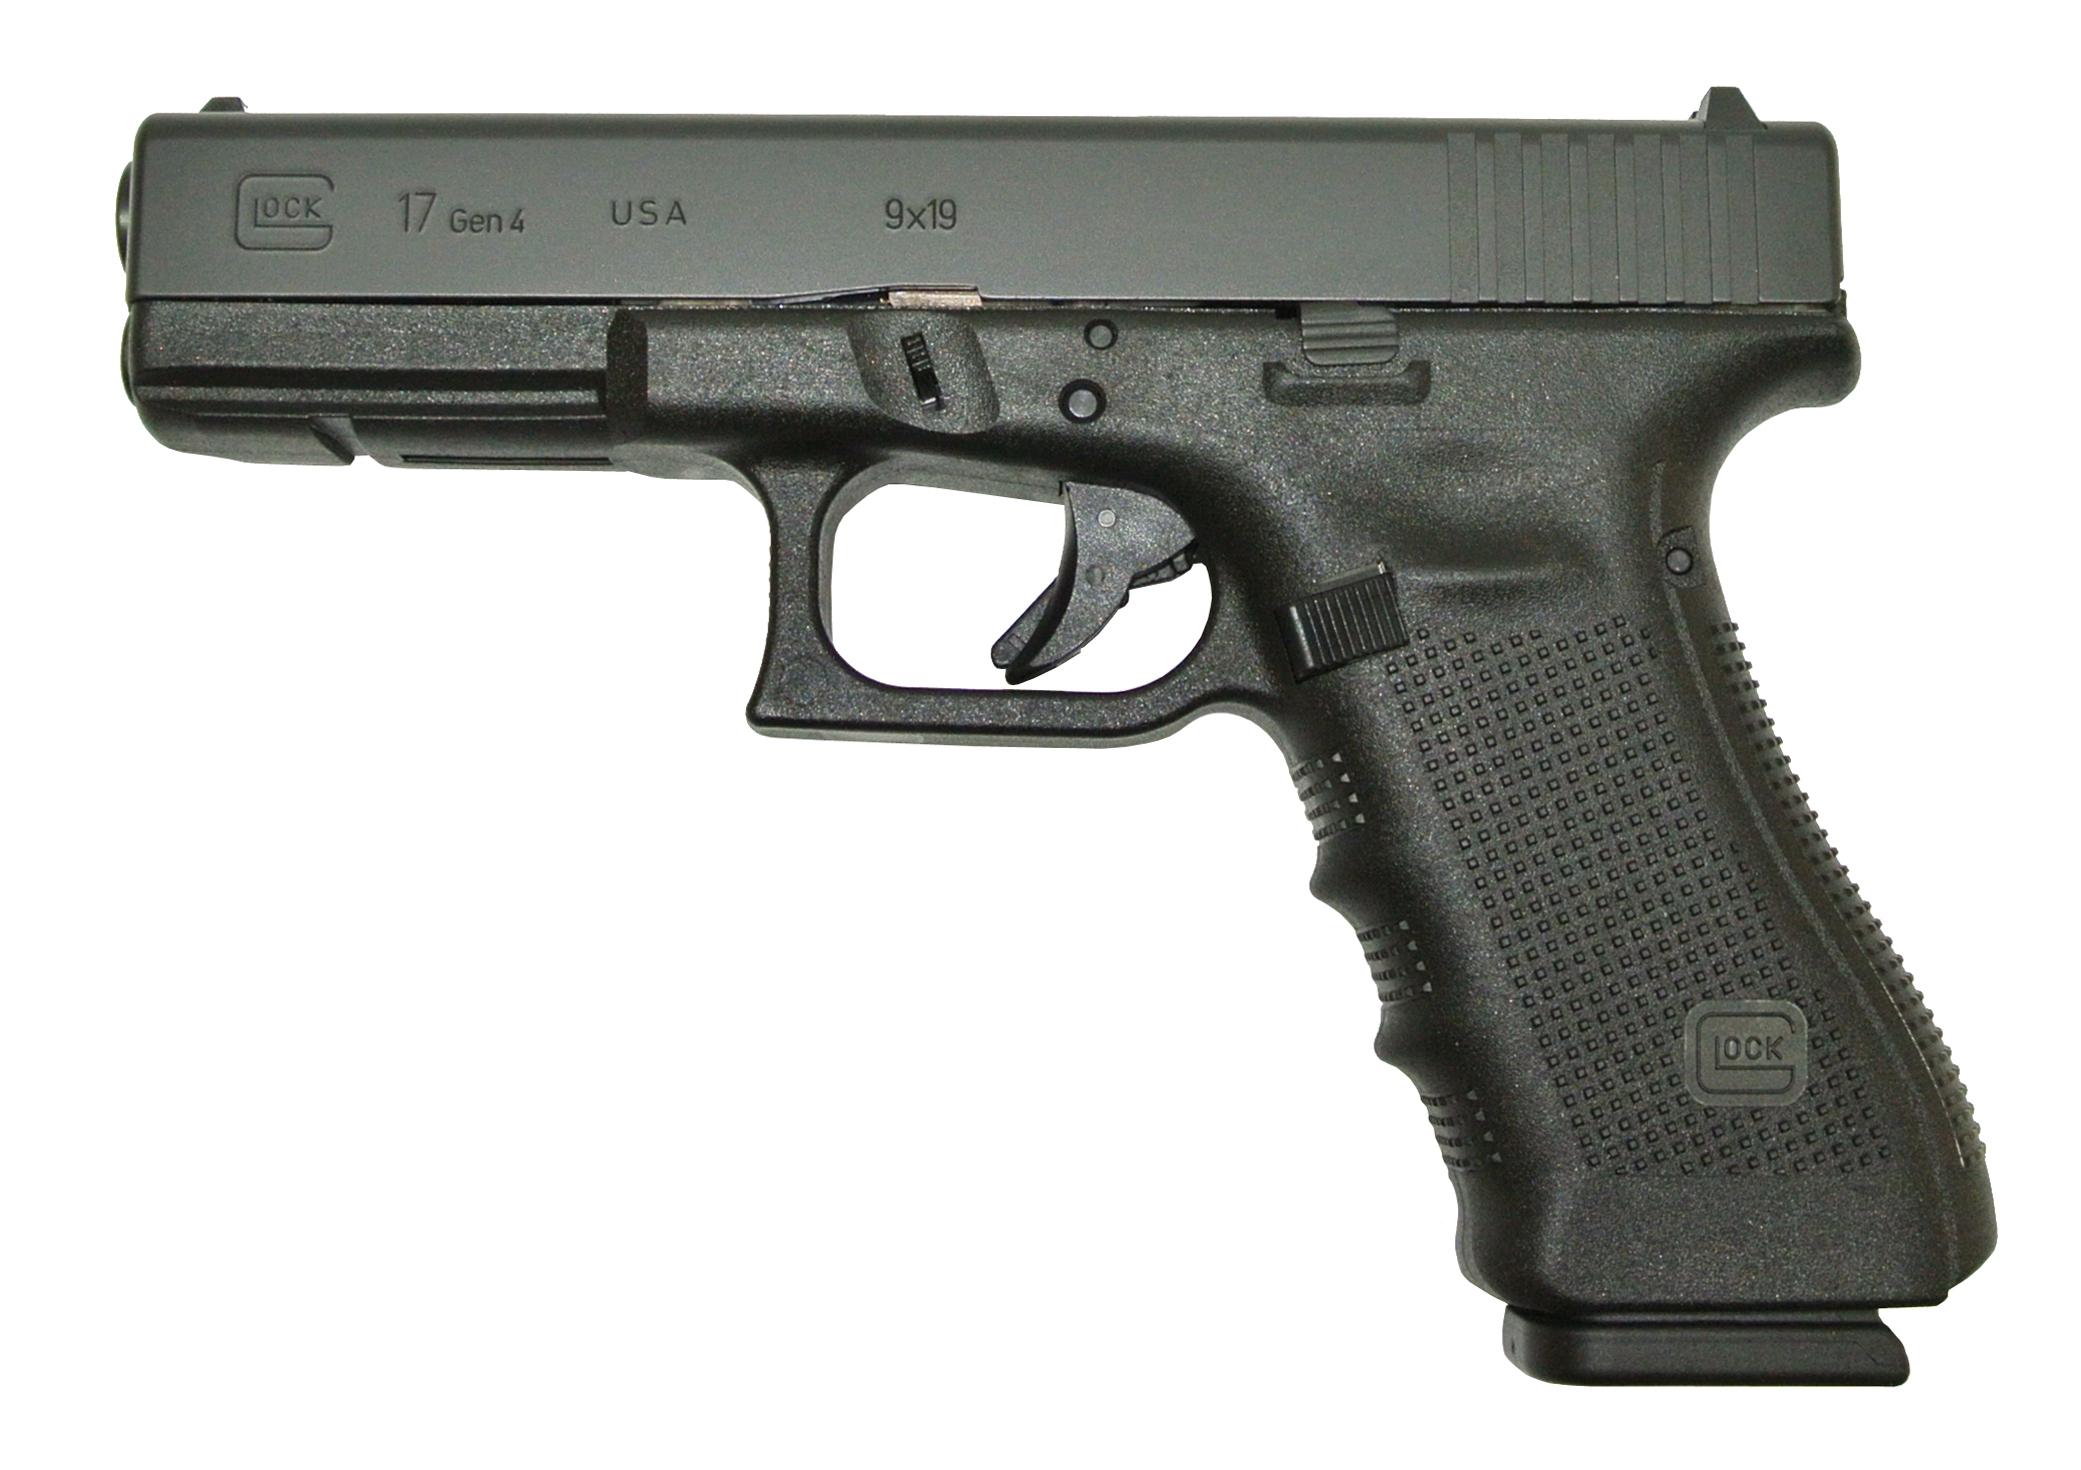 Glock 17 Gen 4 Wallpapers Images Photos Pictures Backgrounds